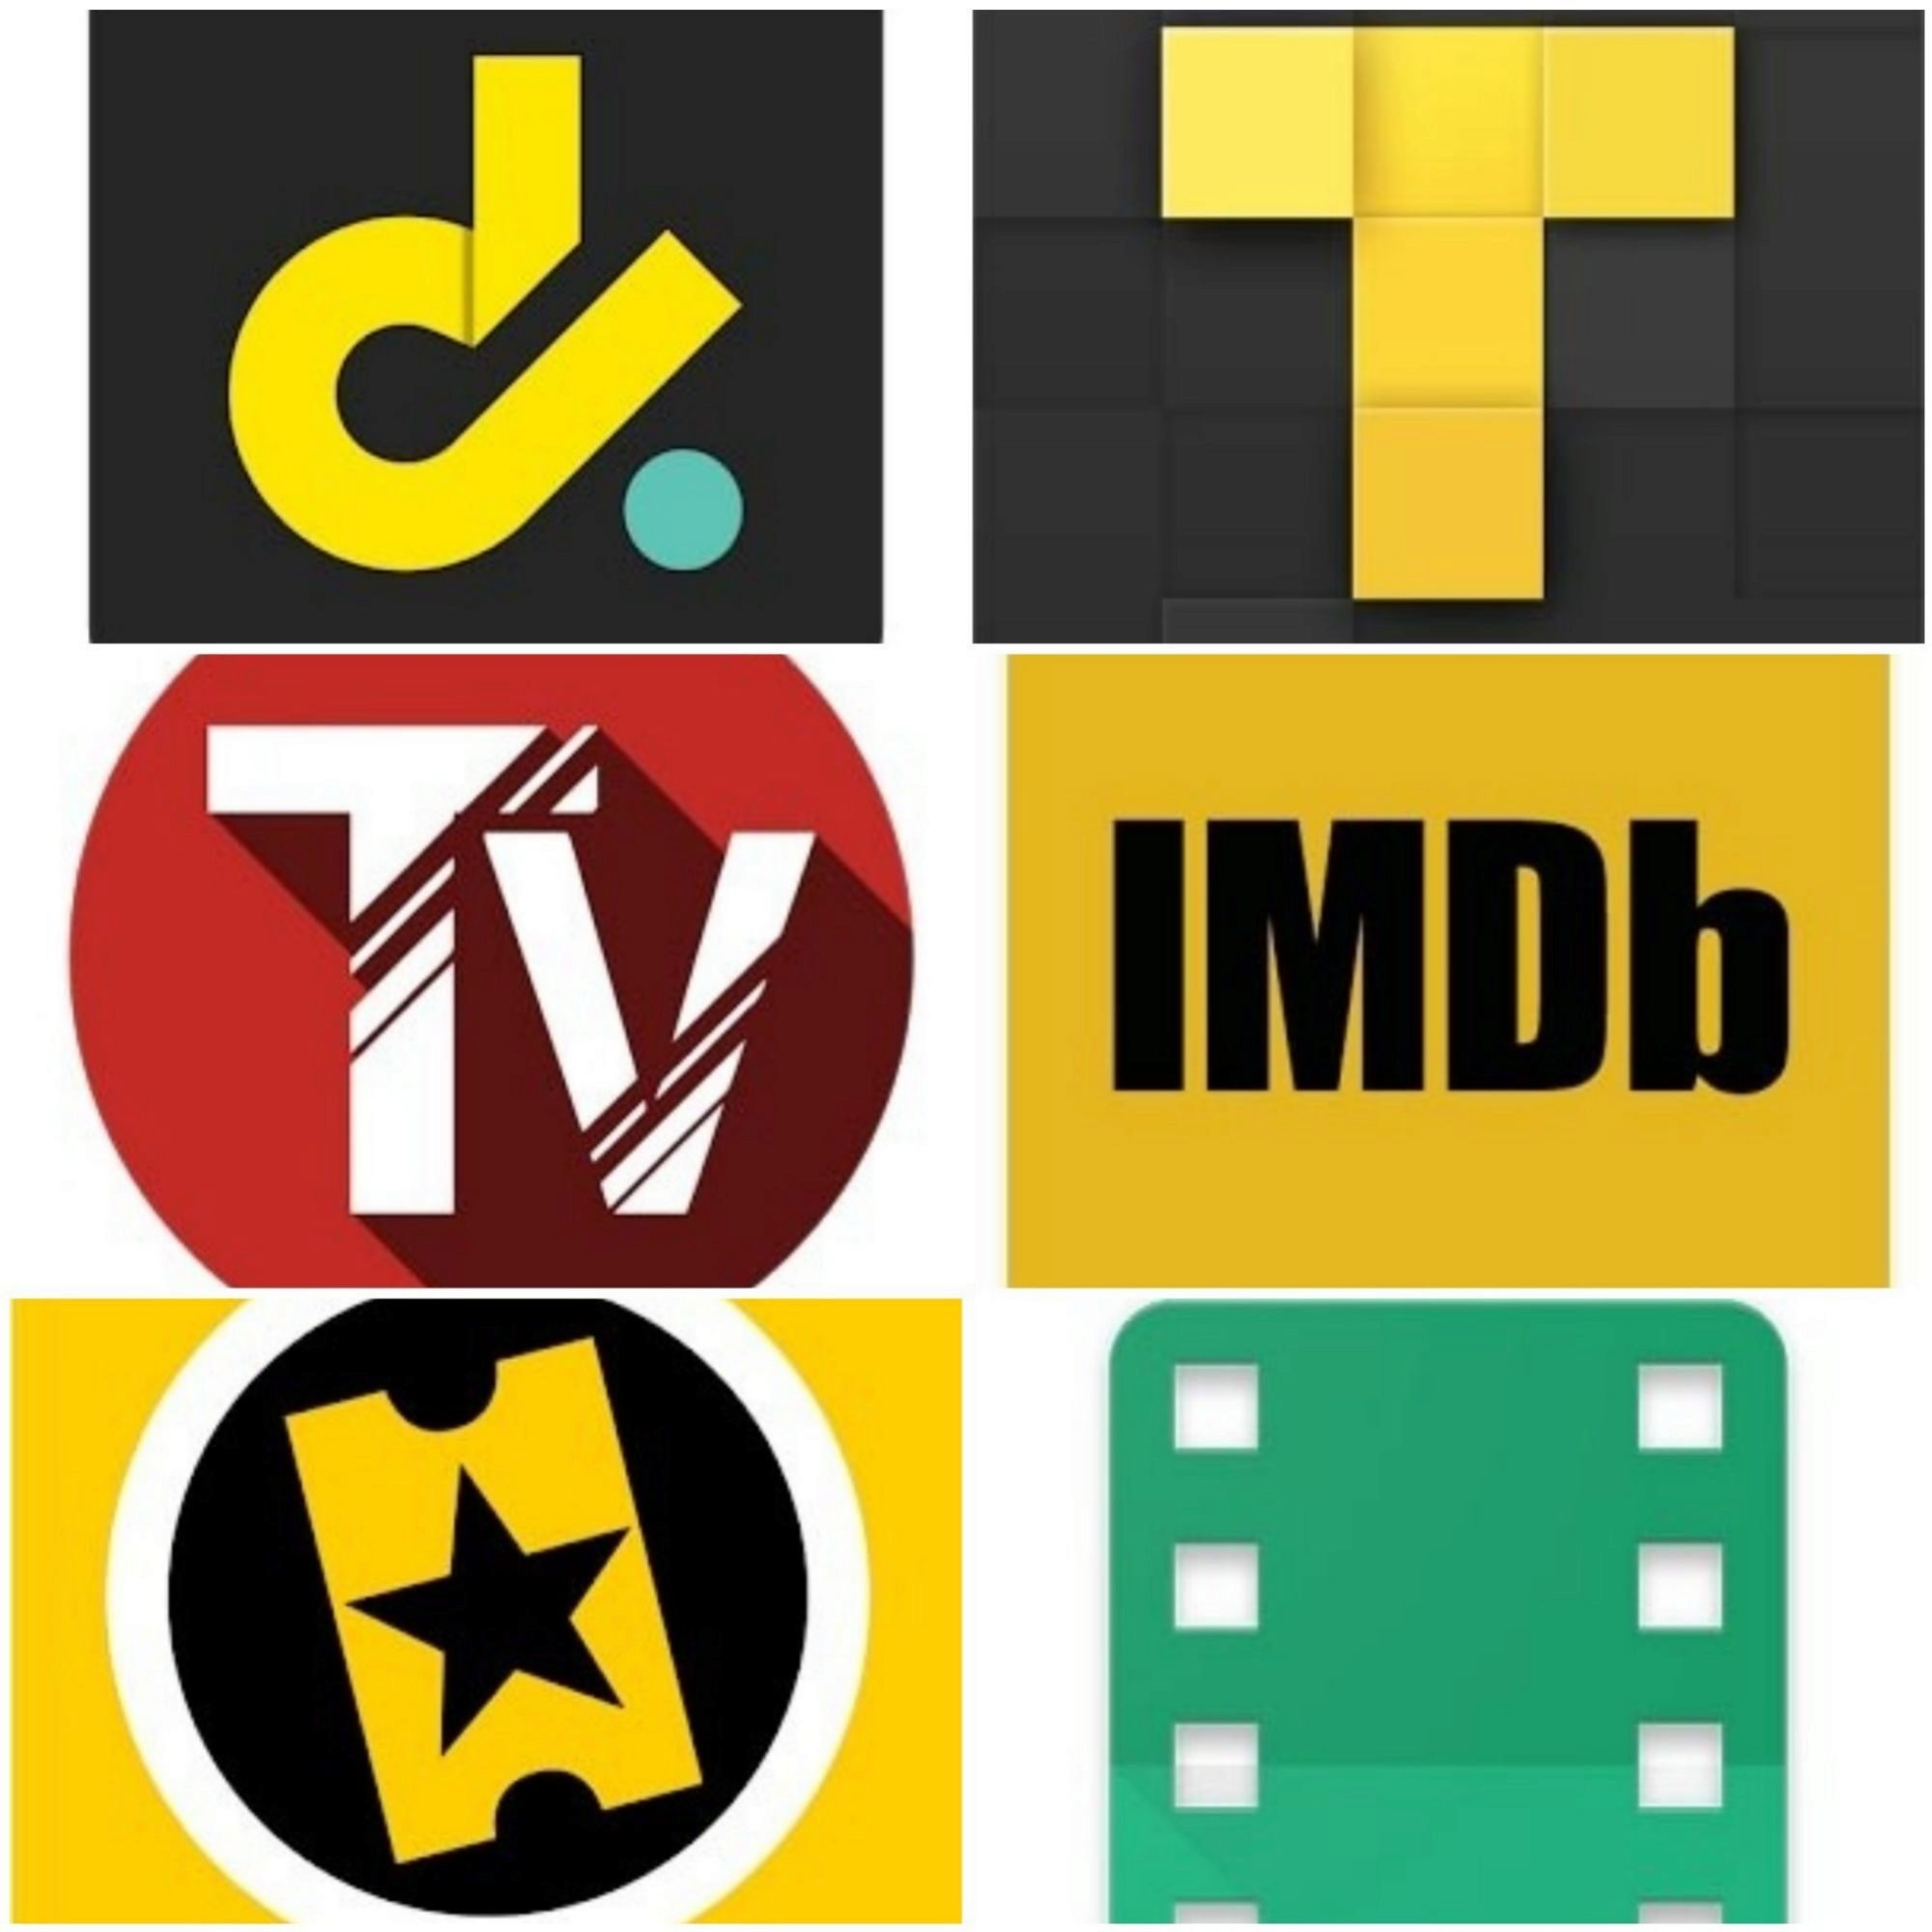 Dive; TvTime; TvSeries; IMDb; Sensacine; Cinematics